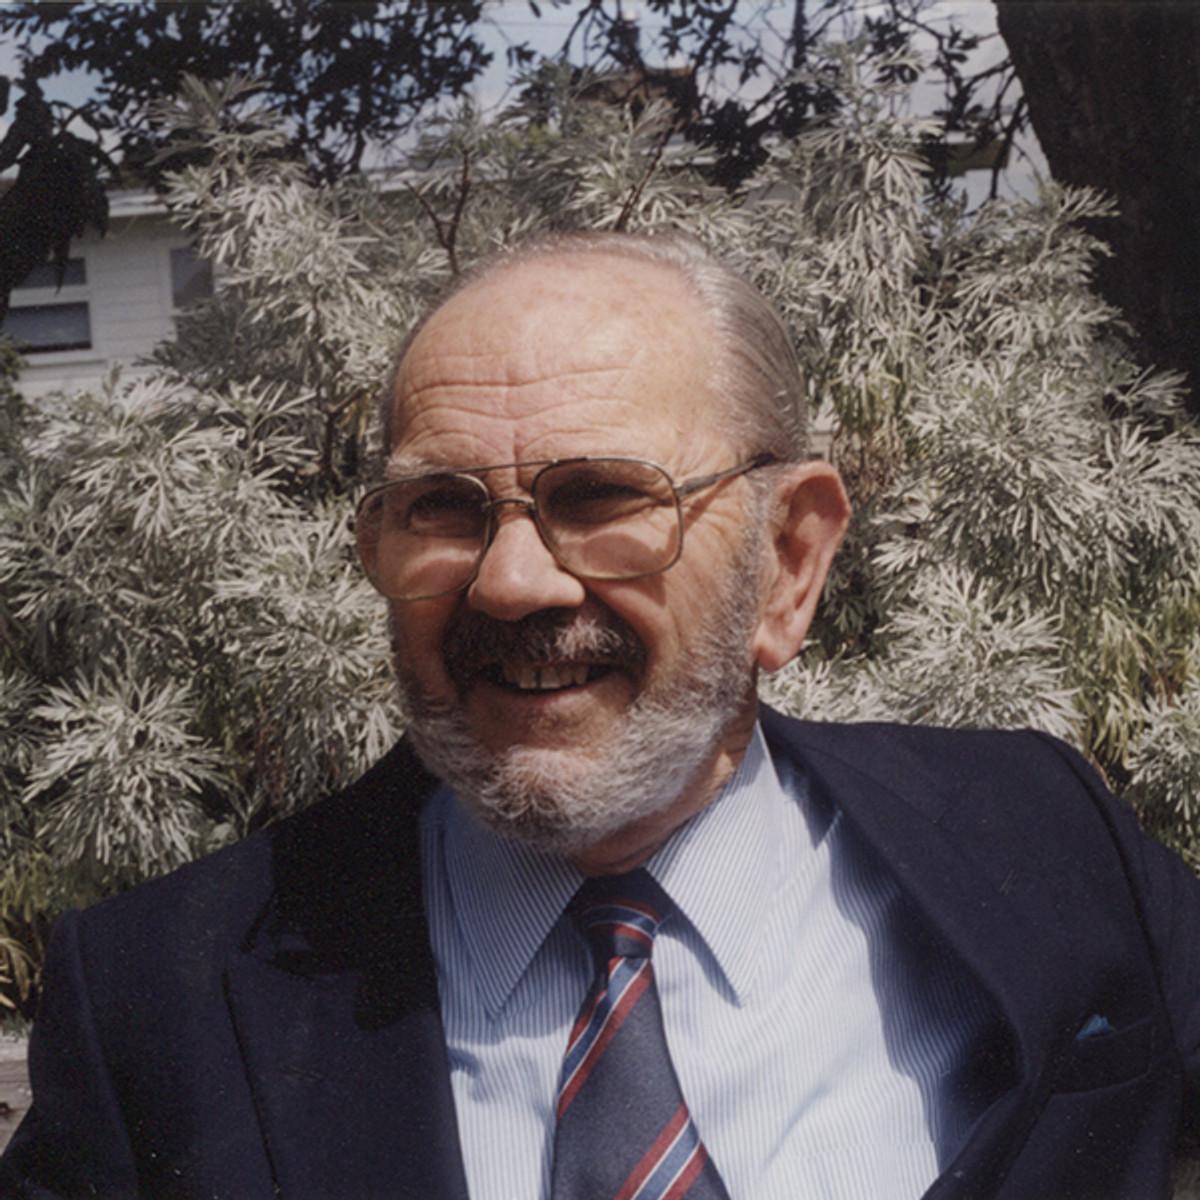 R. C. J. Stone